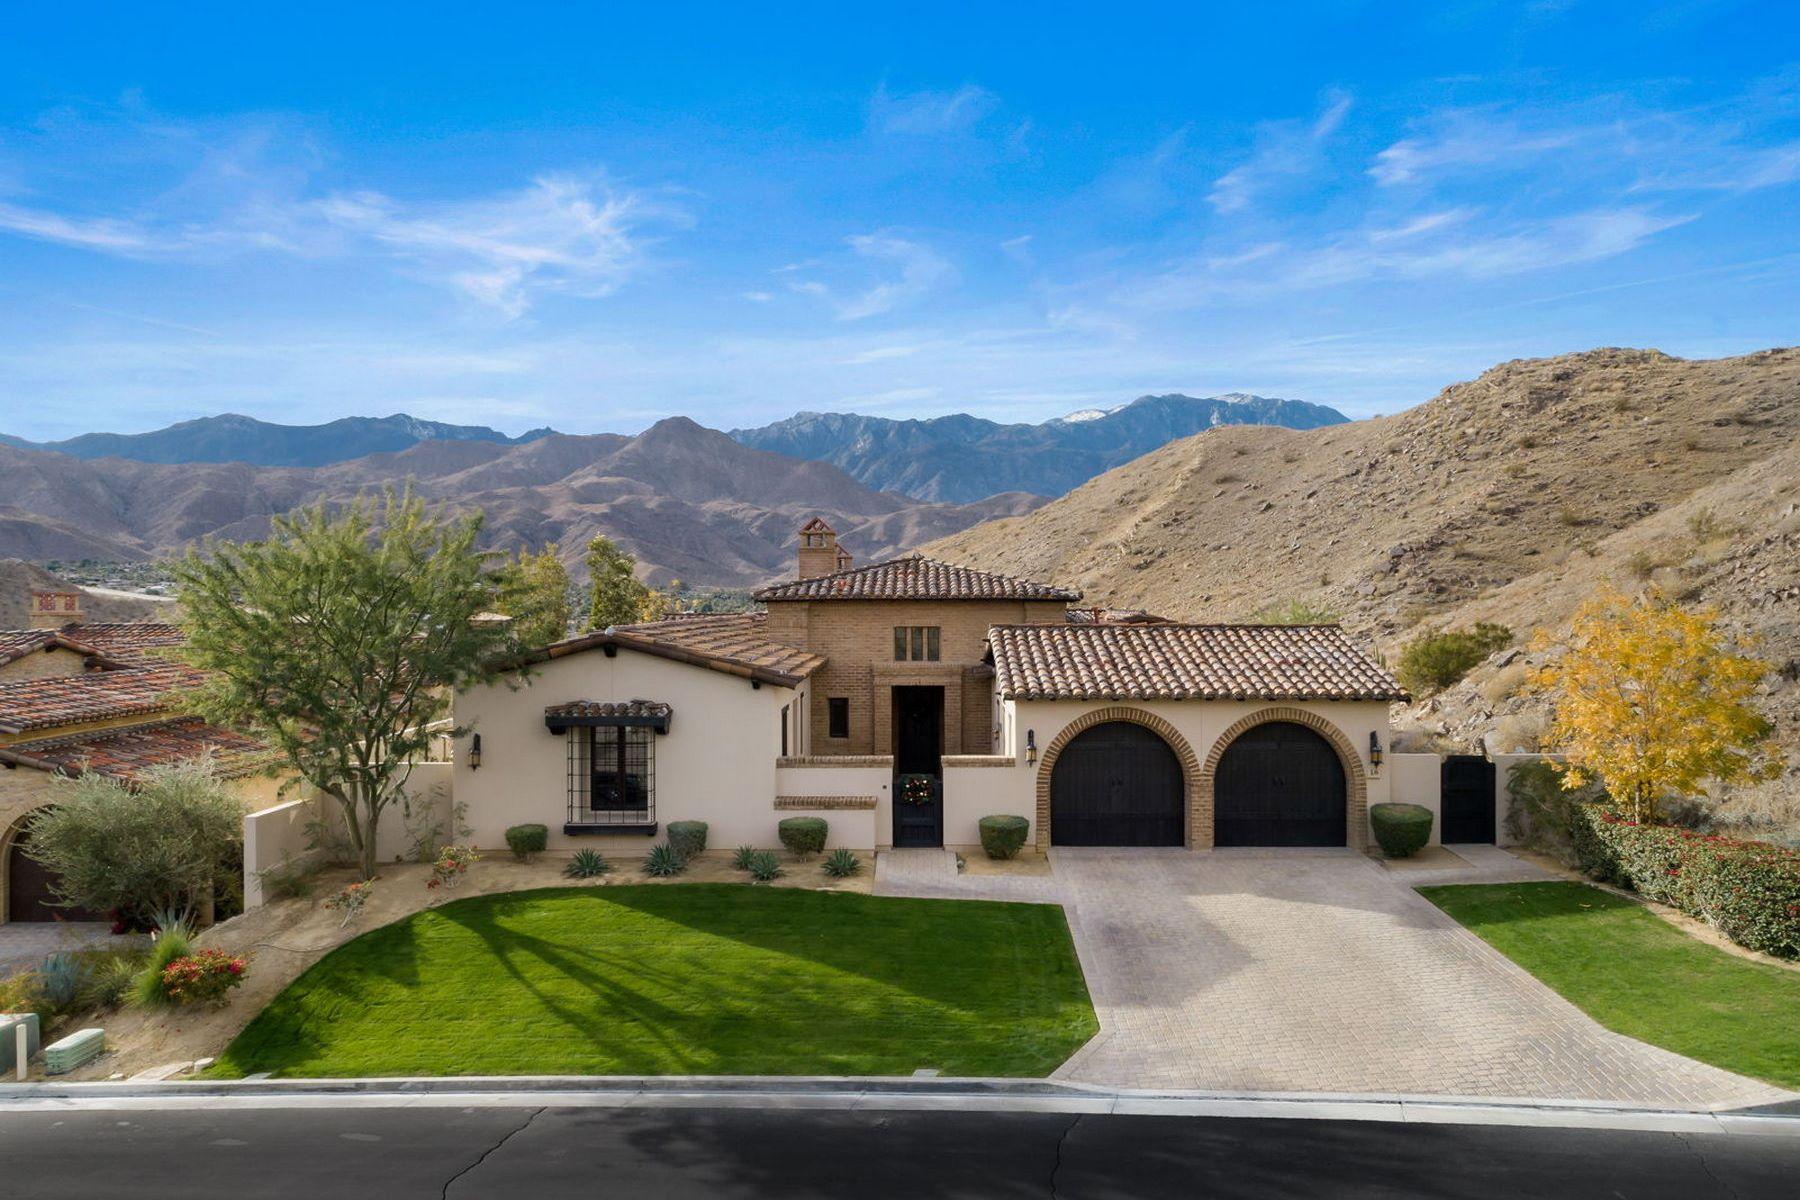 Single Family Homes for Active at 16 Mount San Jacinto Rancho Mirage, California 92270 United States